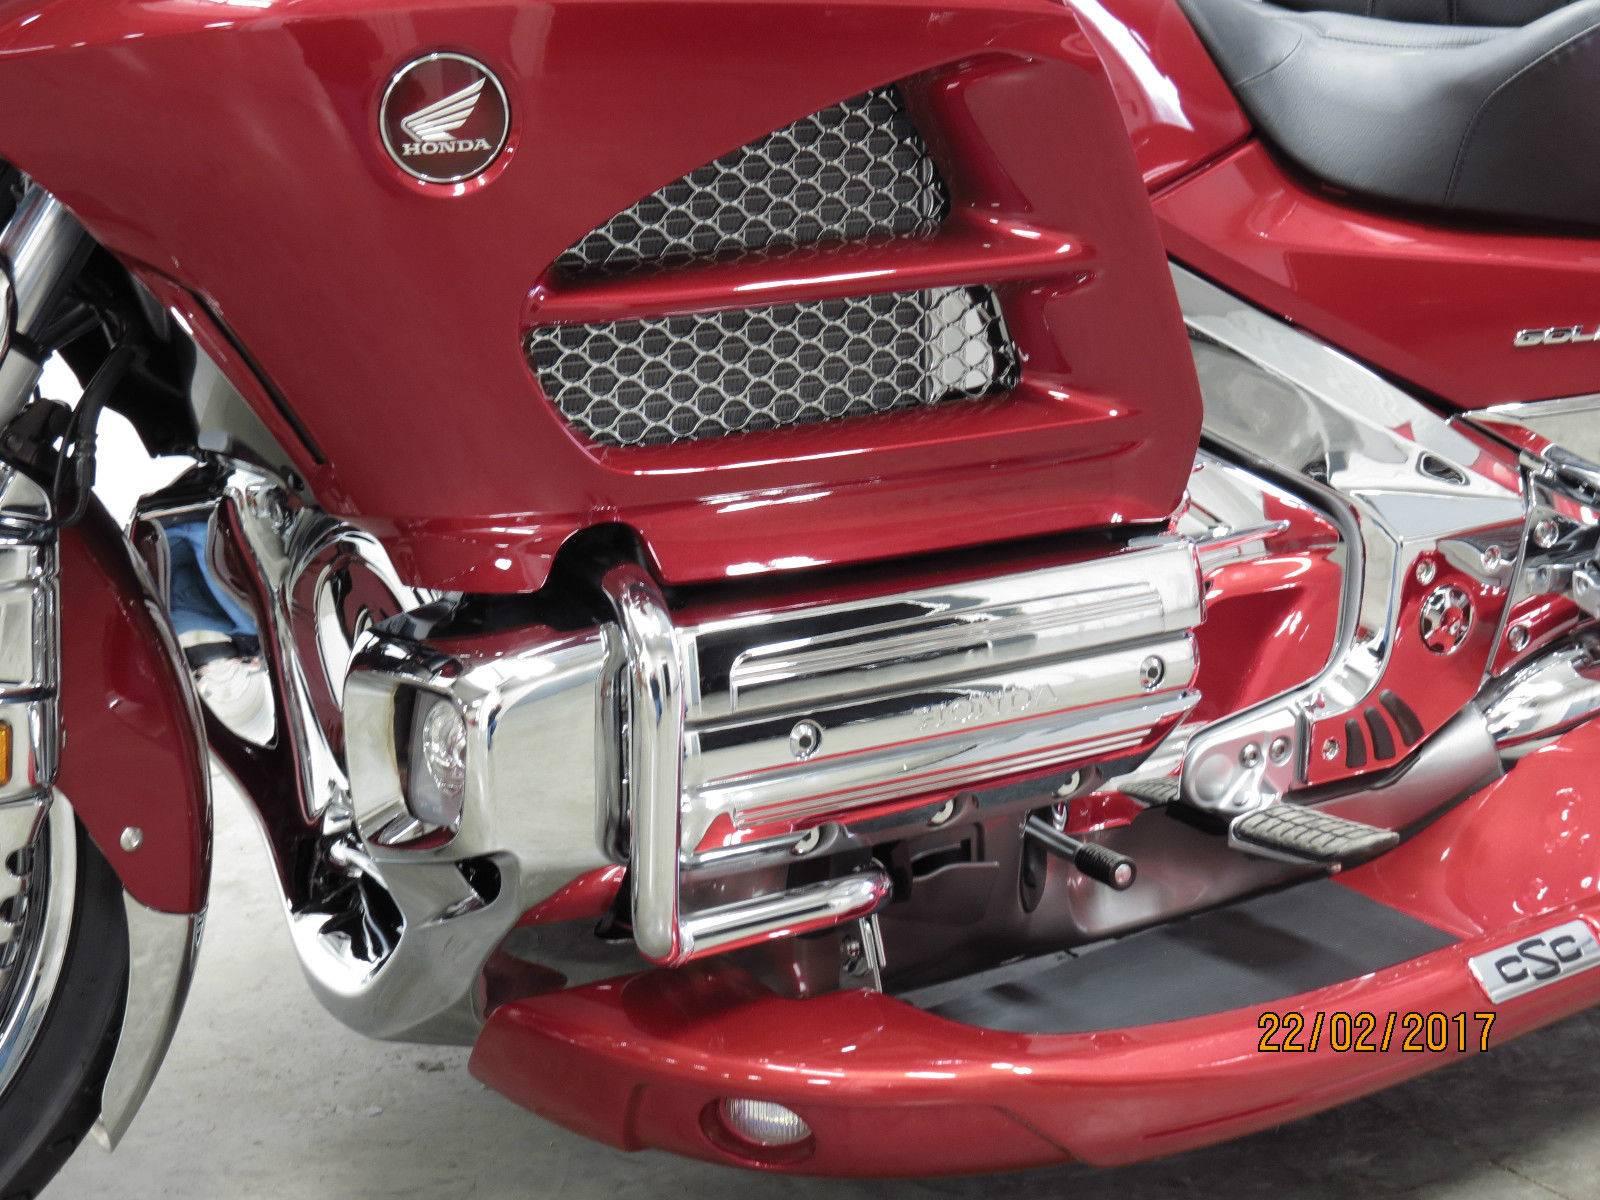 2016 California Sidecar GL1800  VIPER in Lima, Ohio